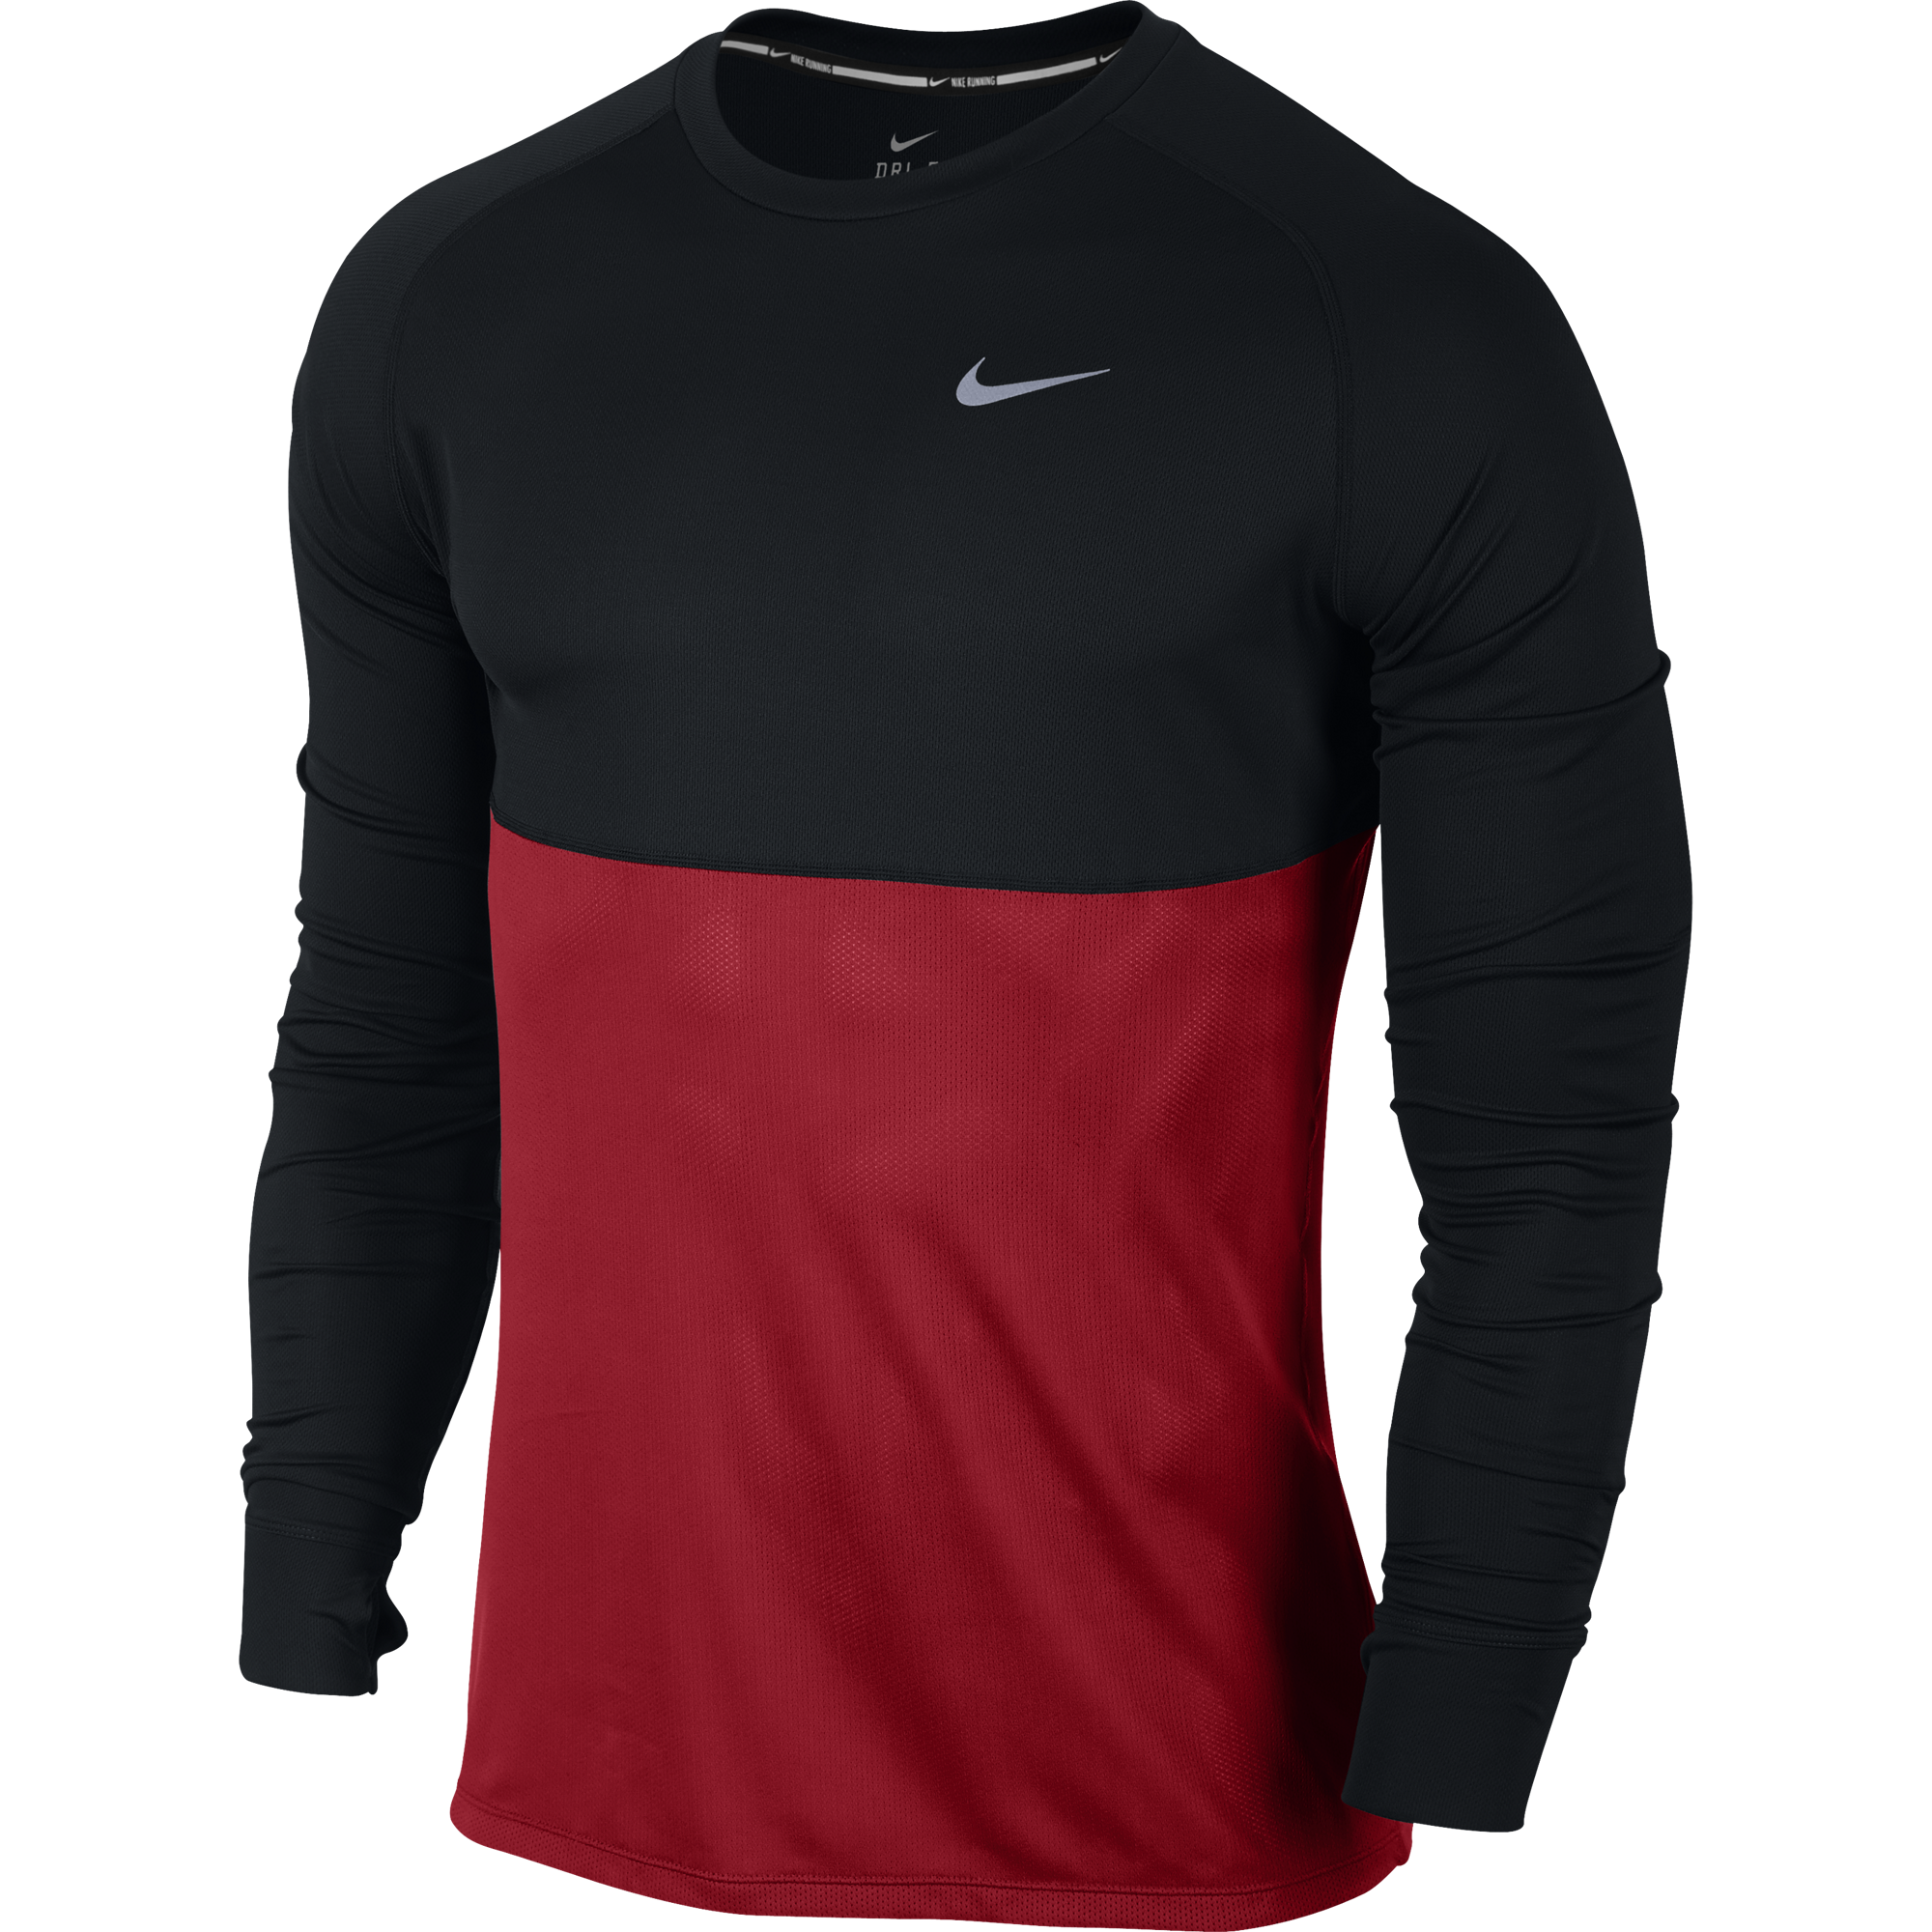 297eb2b8b5 Nike Dri-fit Racer LS 683574-013 Férfi Hosszú Ujjú Póló   Hosszú ...